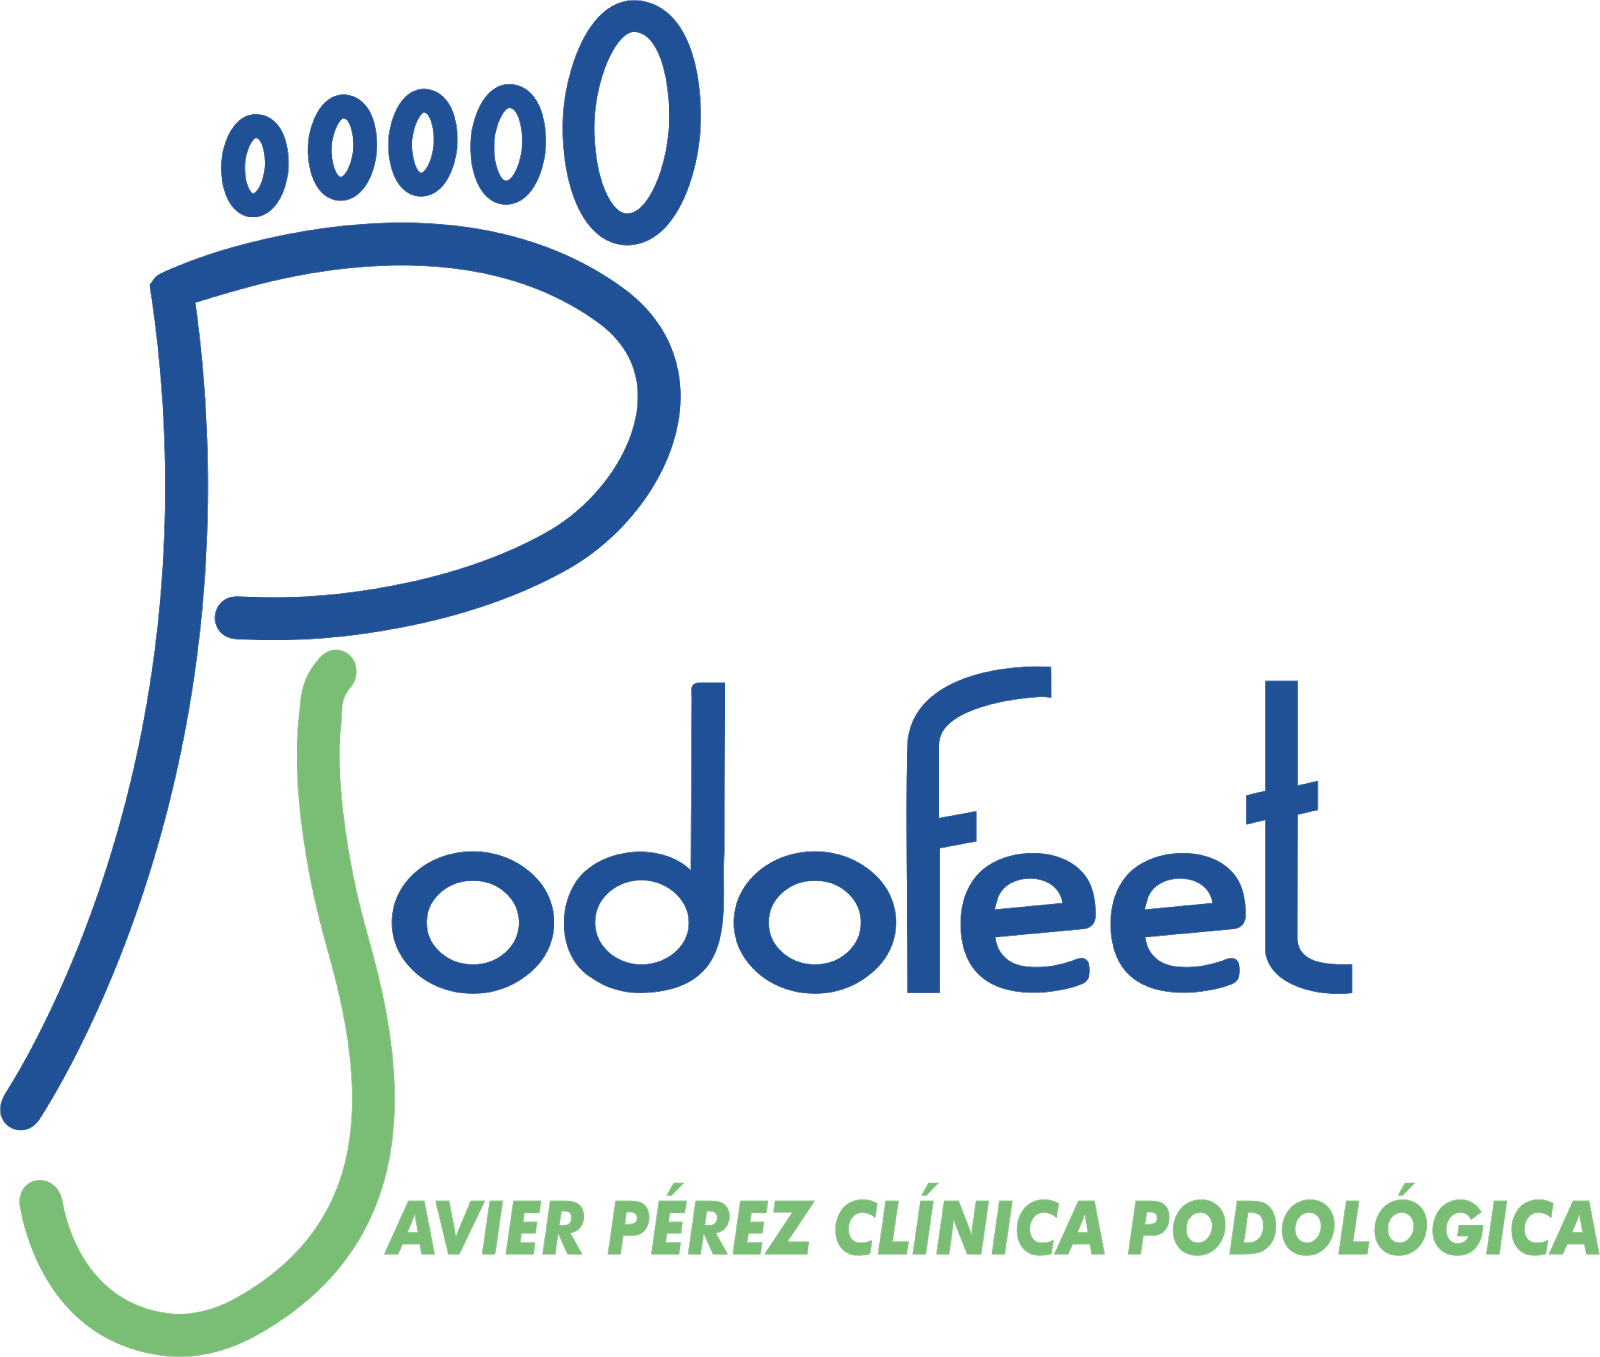 PODOFEET